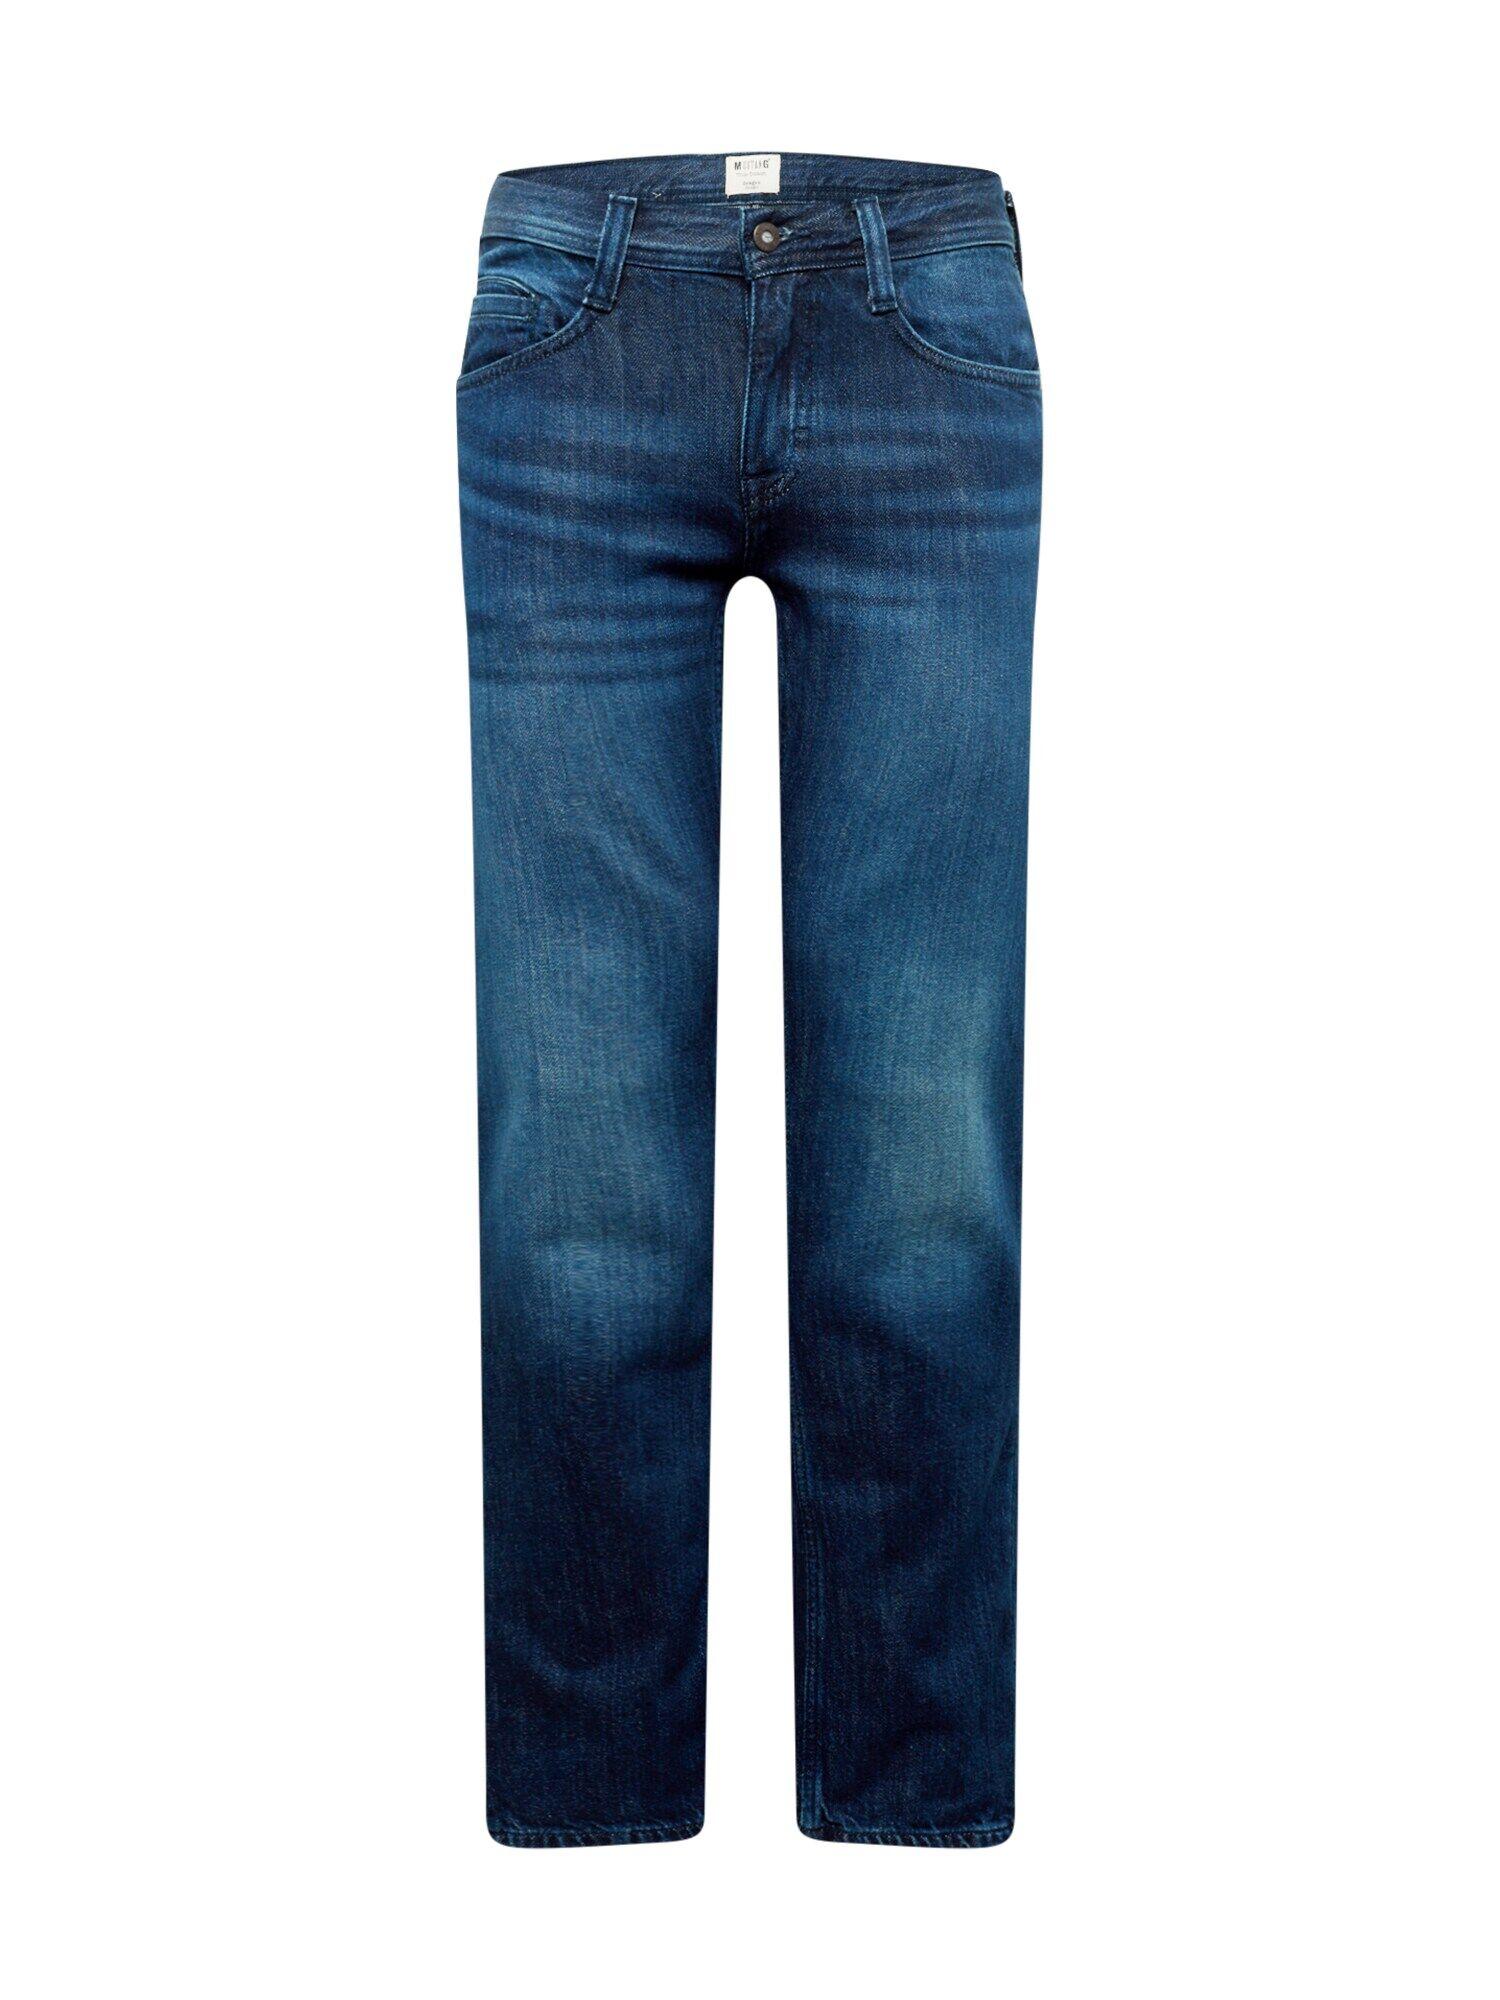 MUSTANG Jean 'Oregon'  - Bleu - Taille: 38 - male